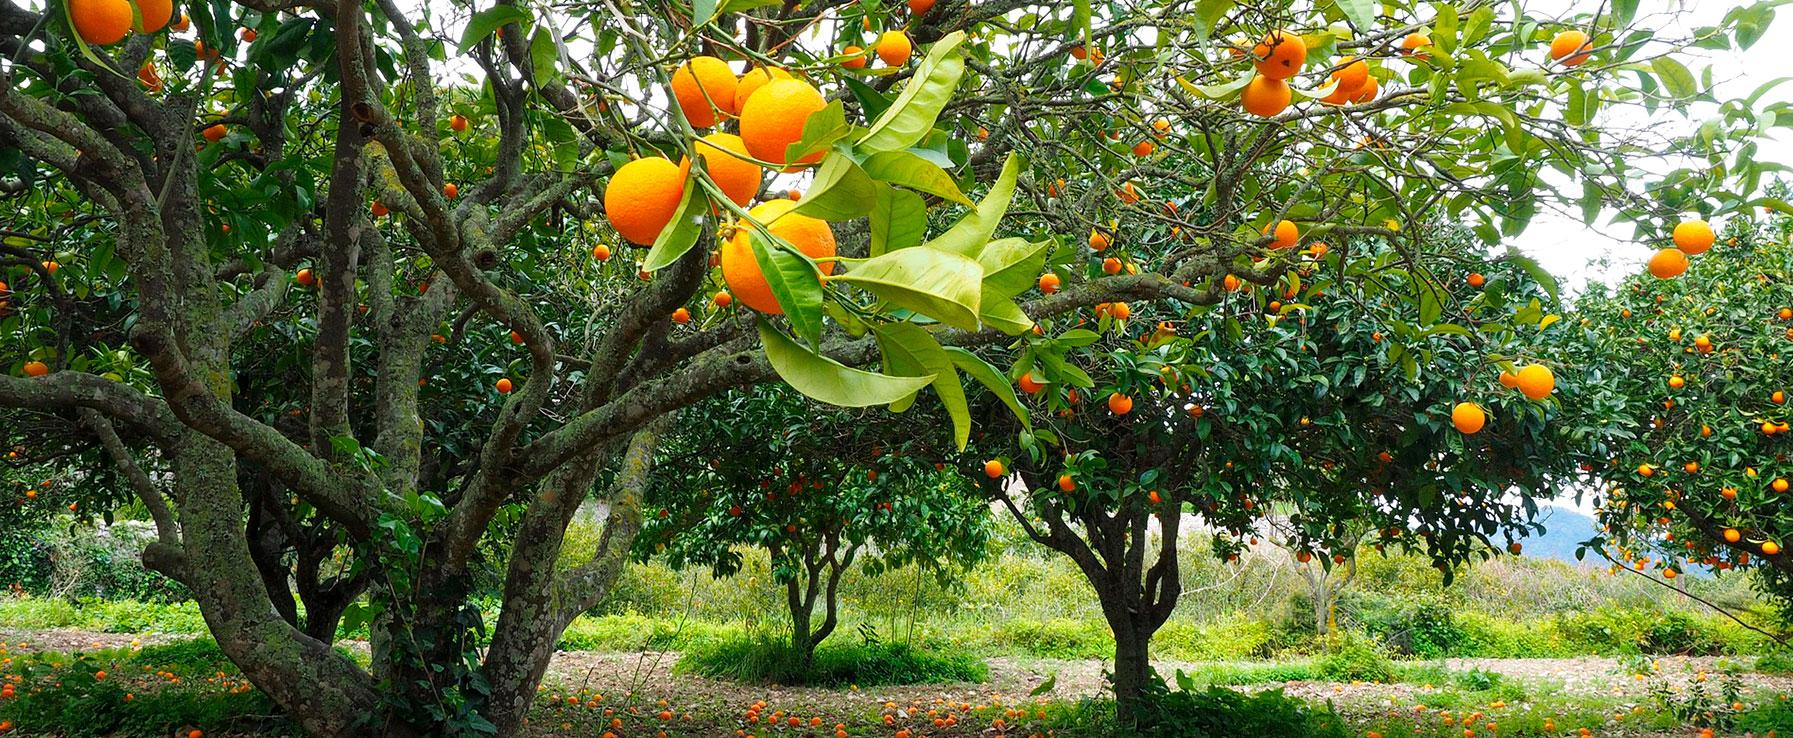 Frutales sun plantes viveros s l for Arboles frutales para jardin